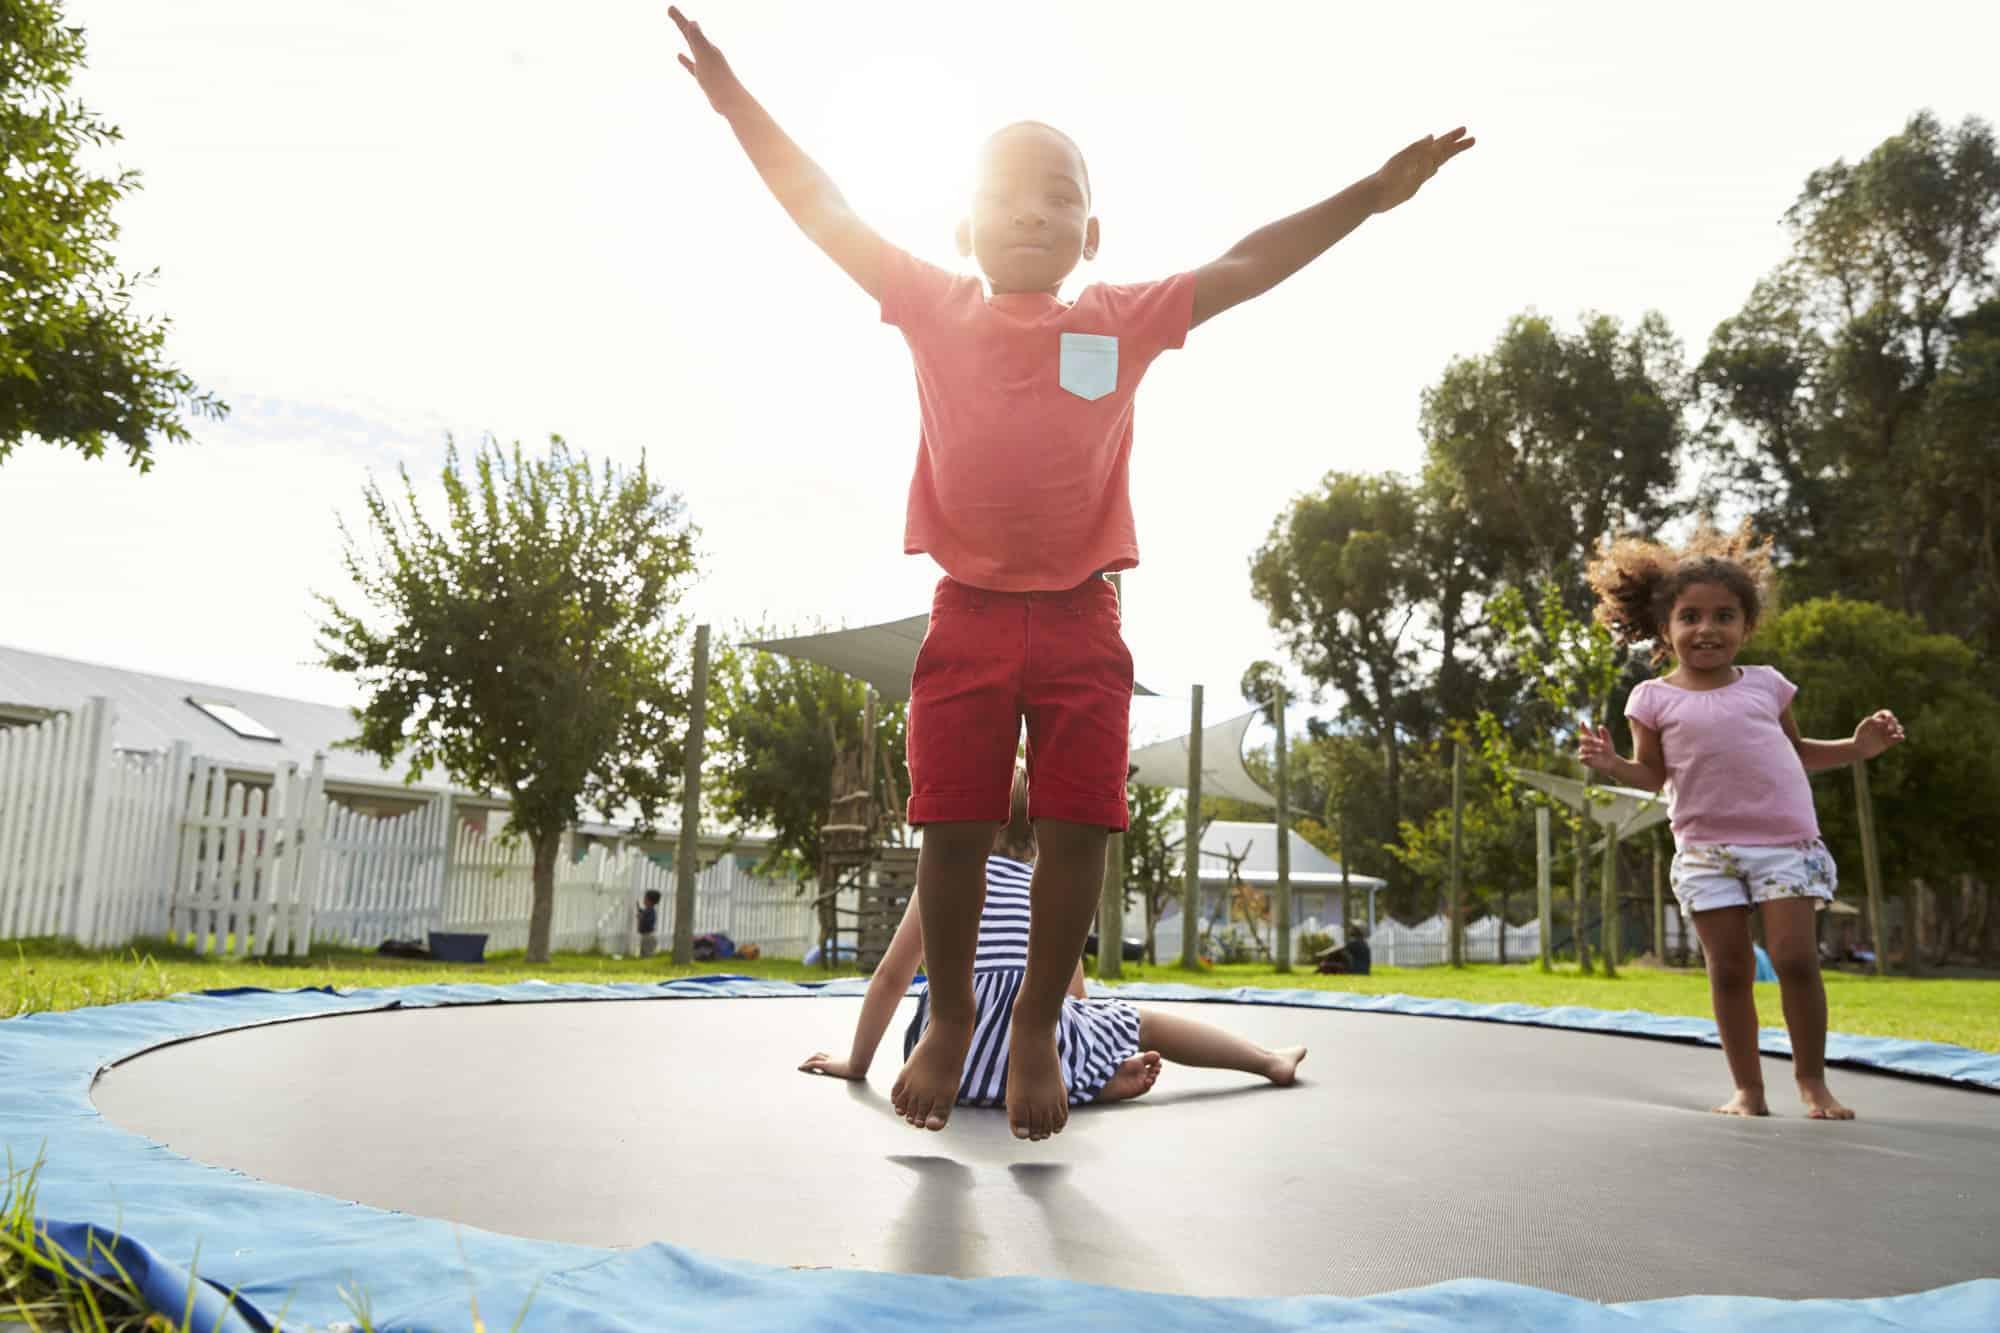 Børn der hopper på havetrampolin